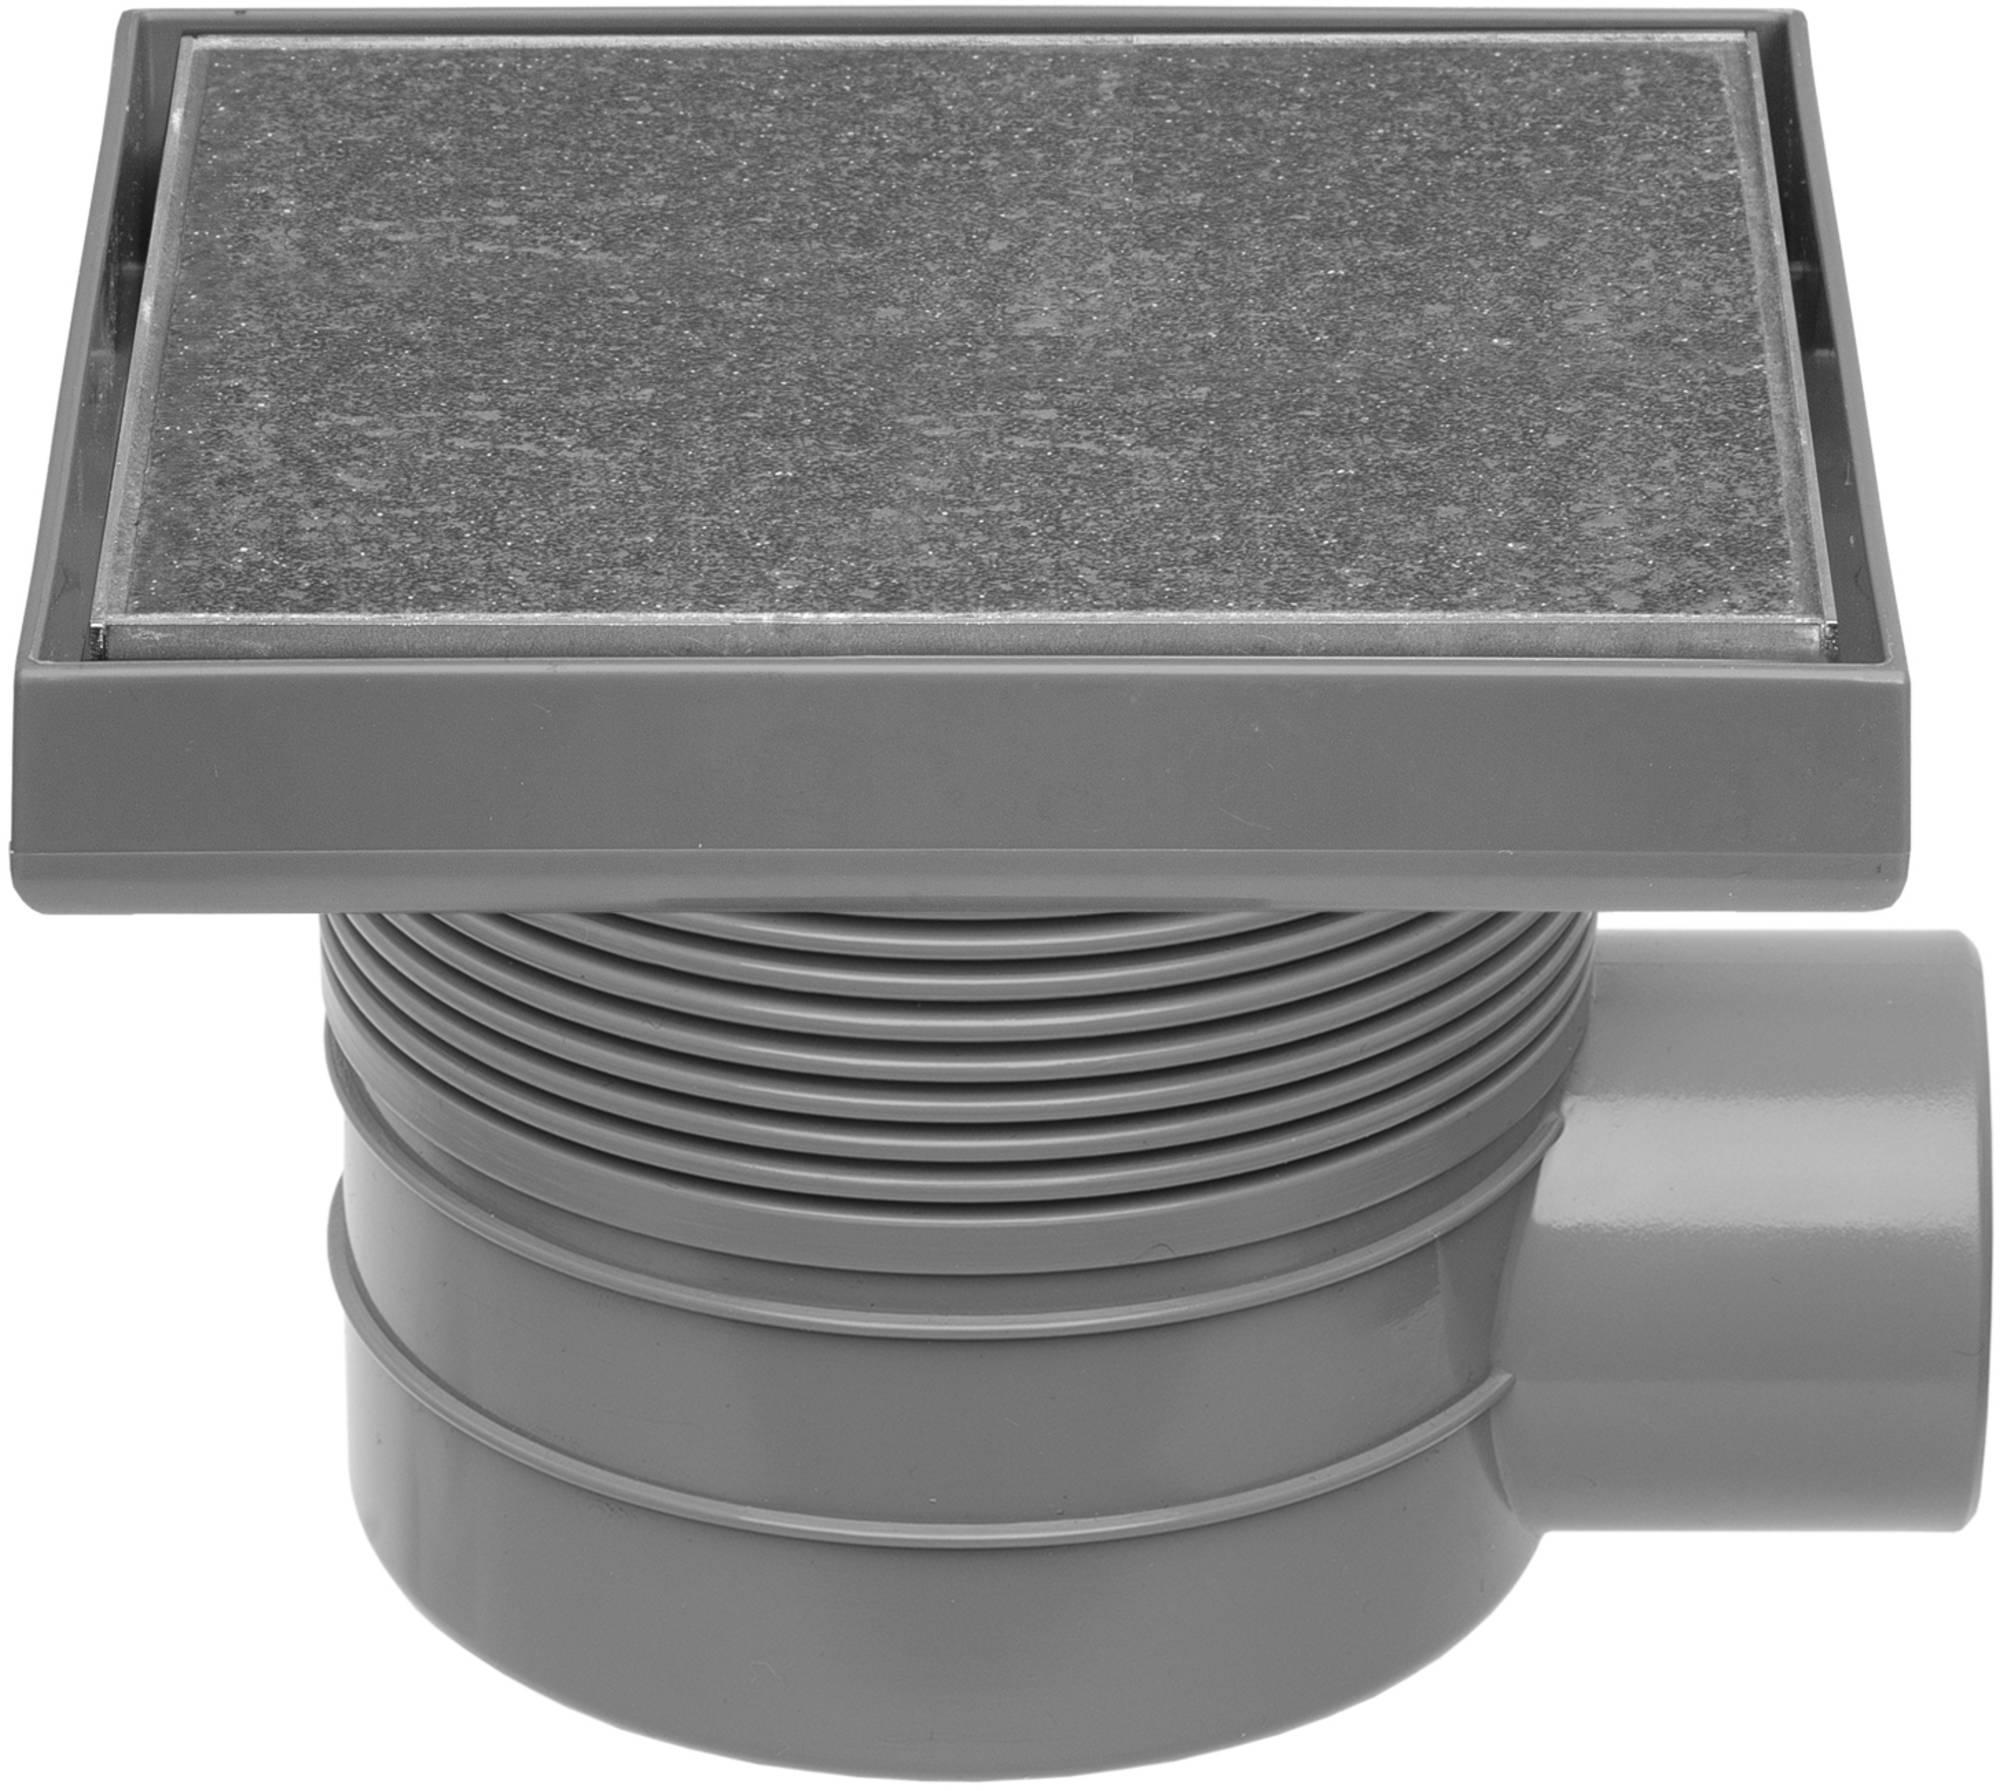 Easydrain Aqua quattro tegel vloerput abs 15x15 cm, horizontaal, tegel-rvs